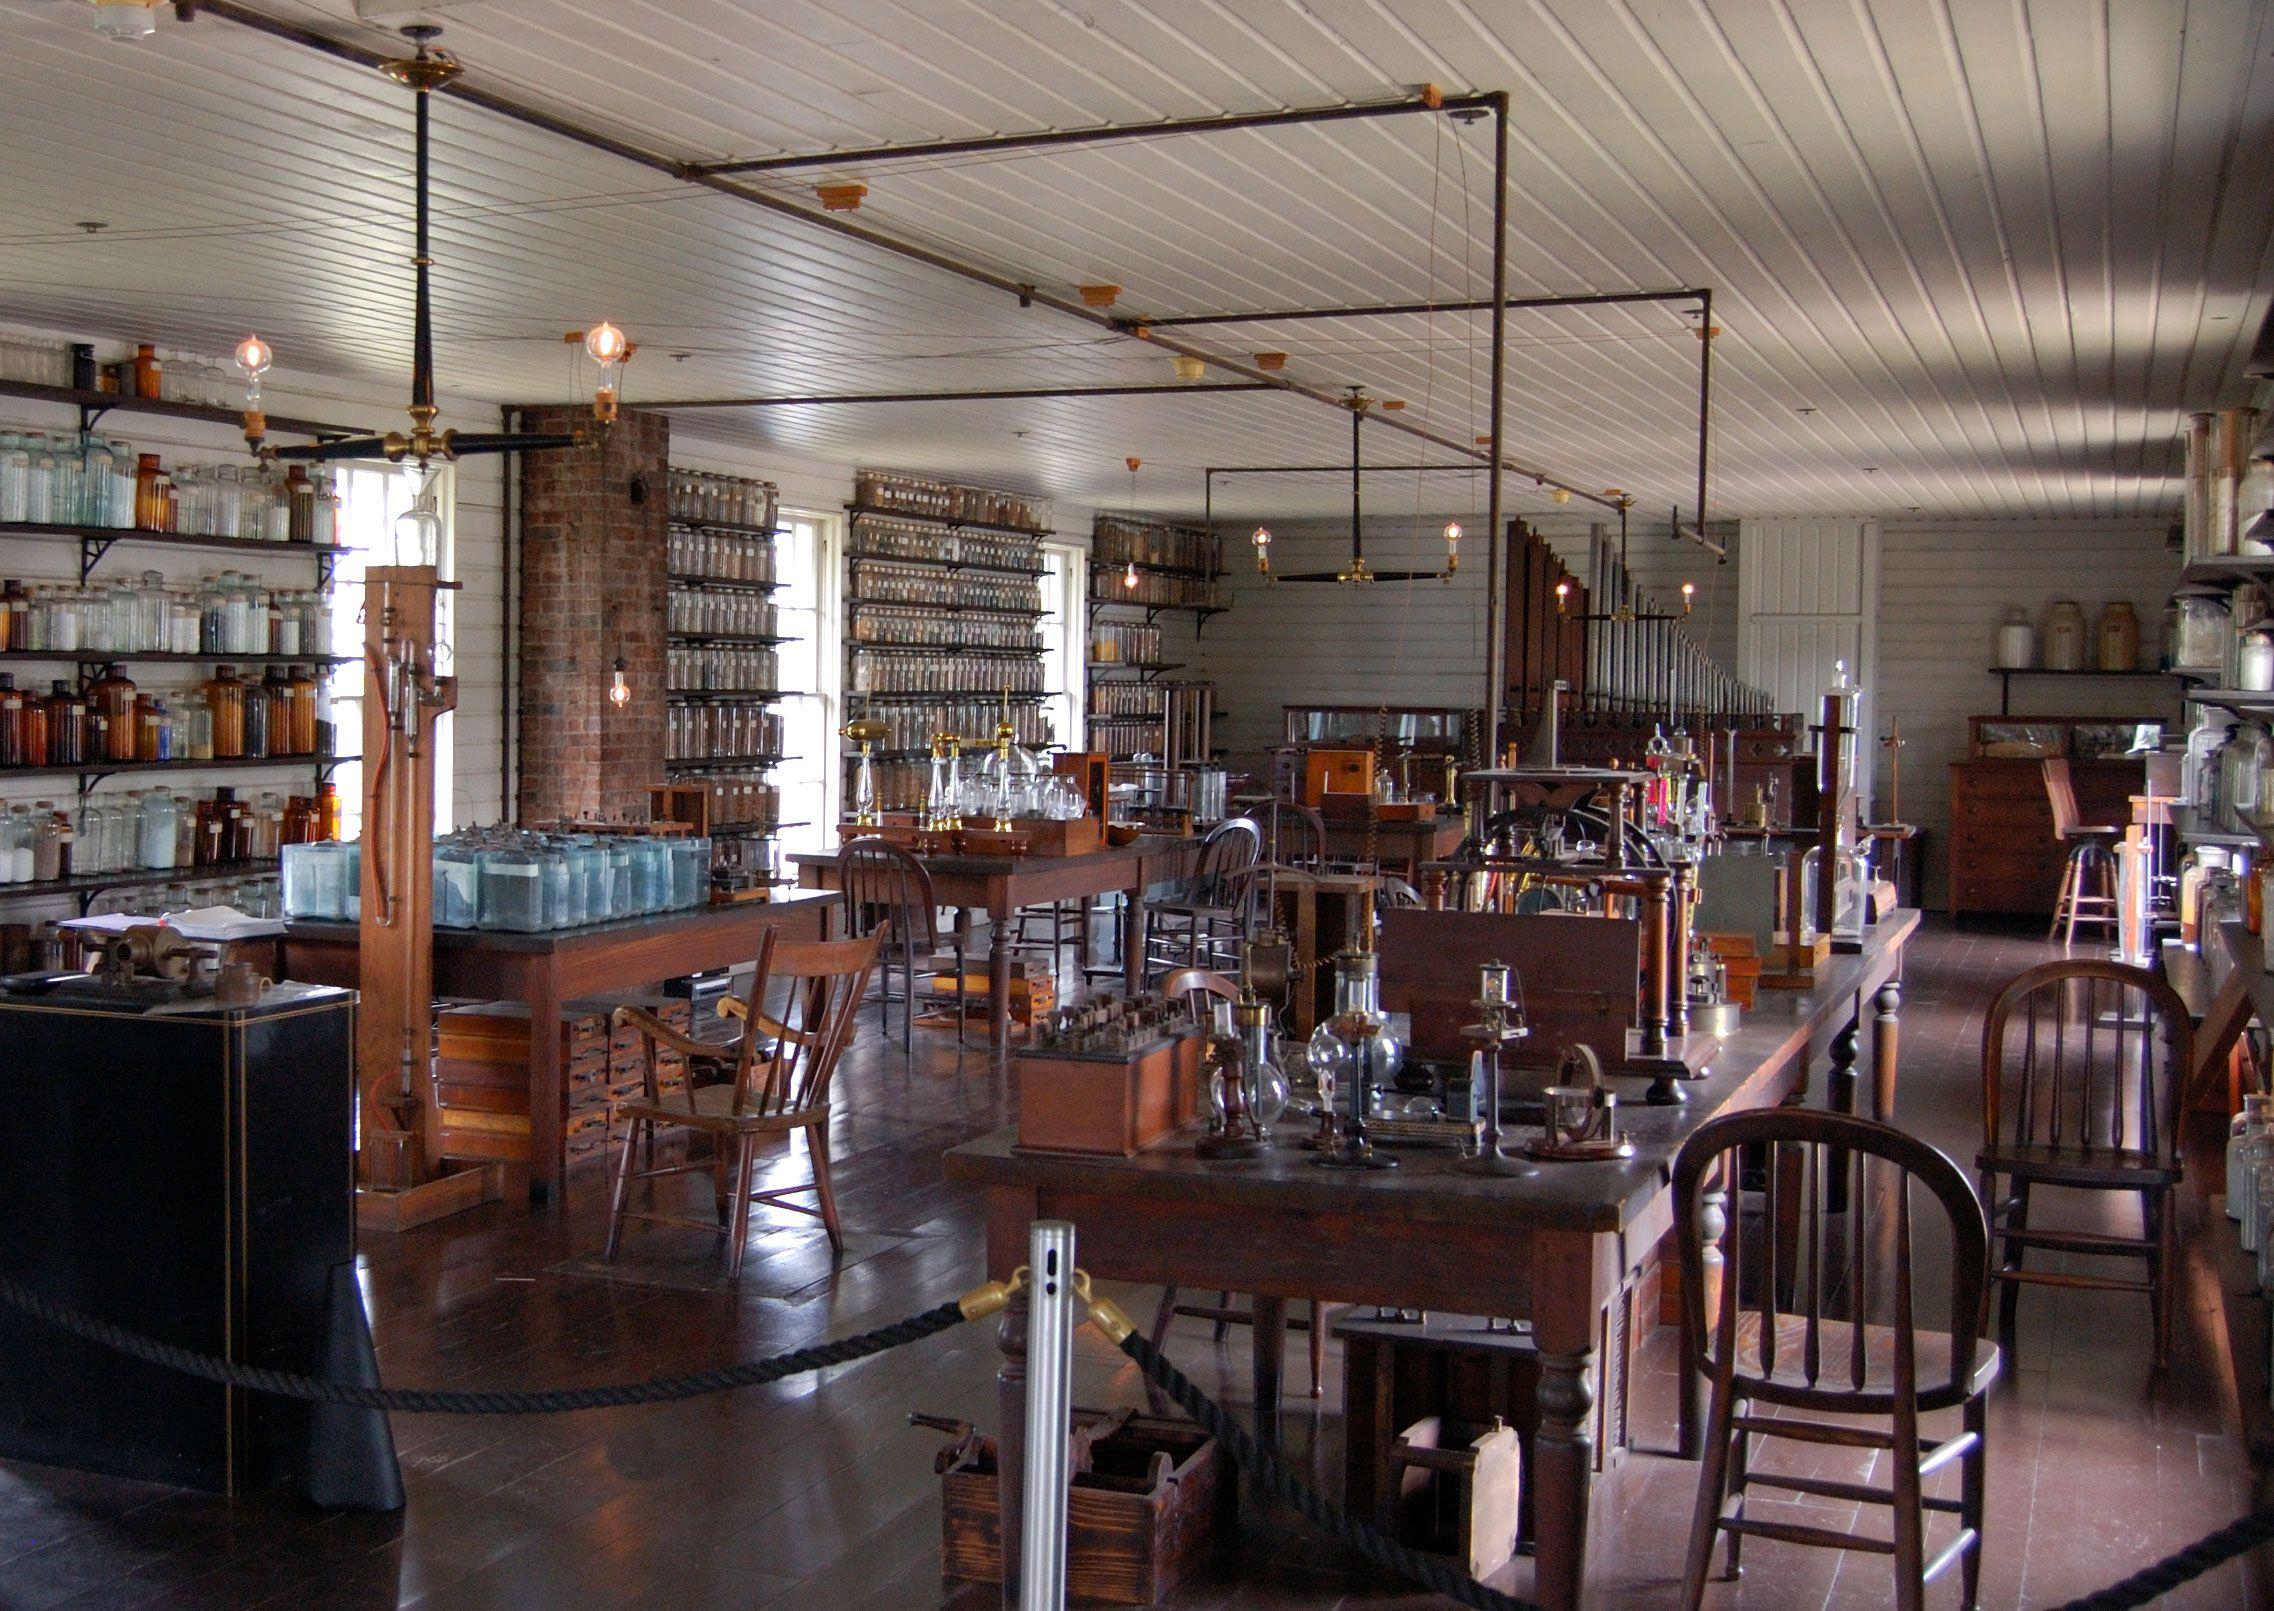 laboratório edison - Pesquisa Google